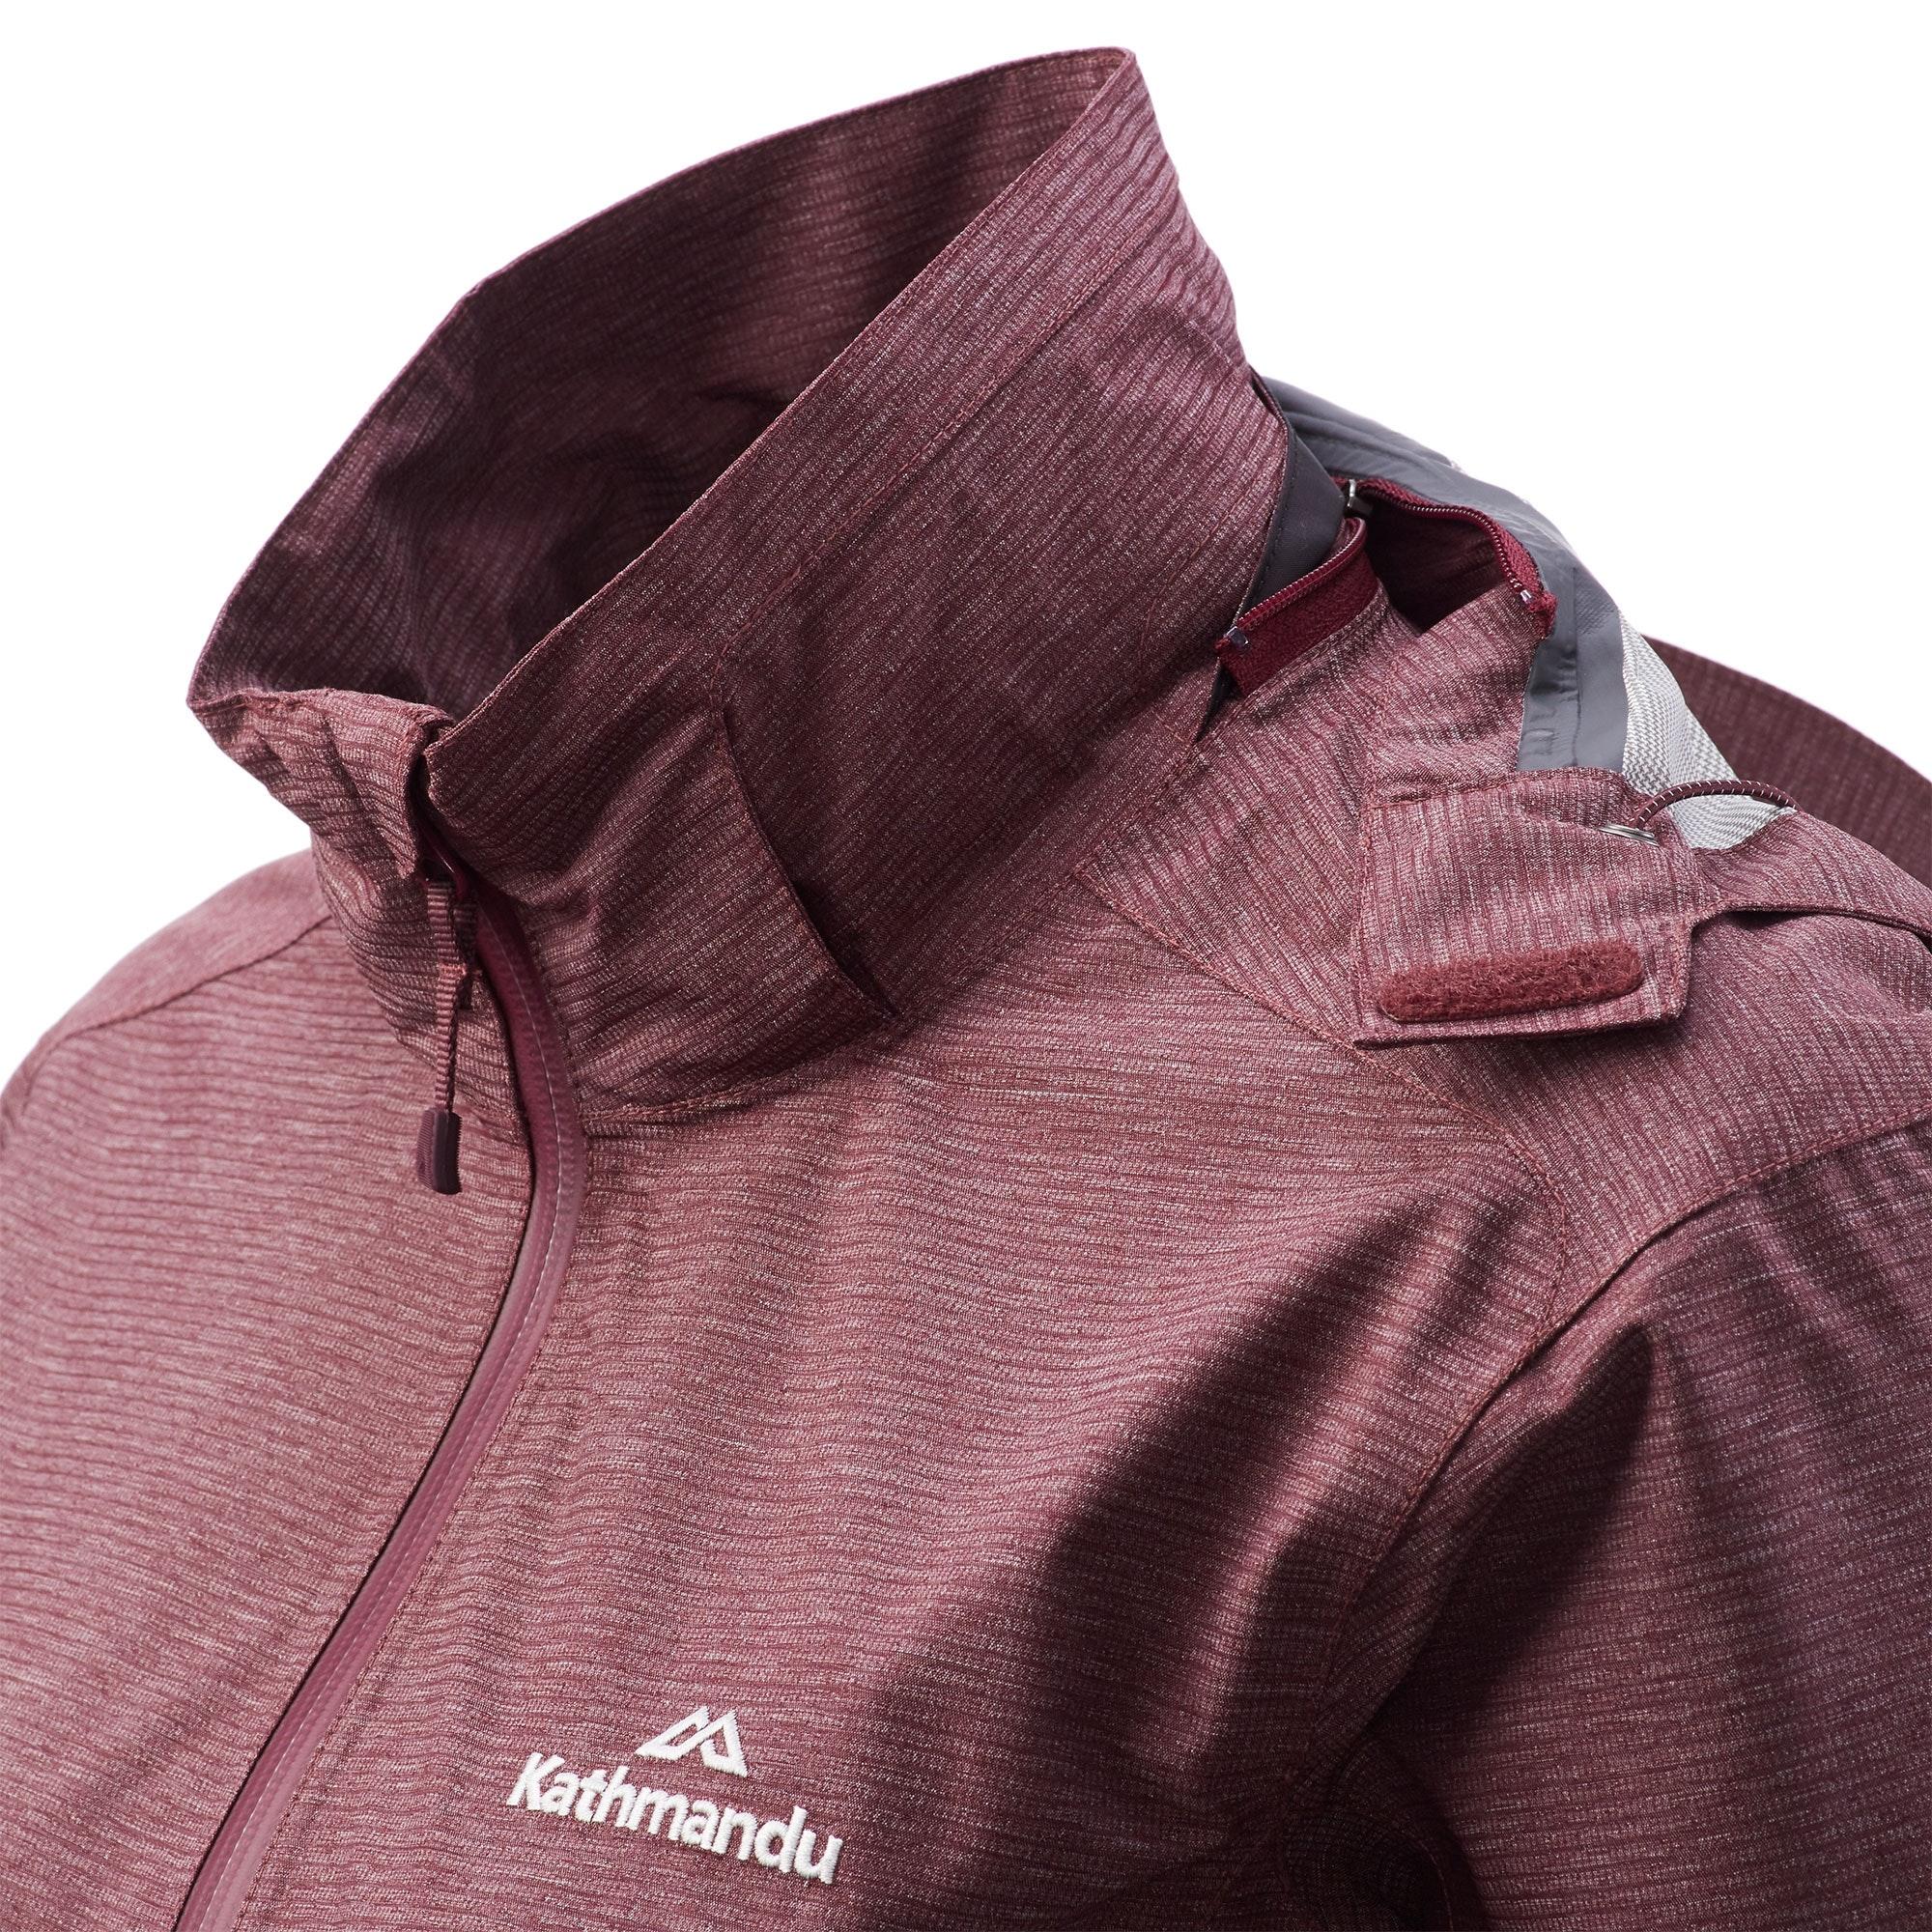 NEW-Kathmandu-Lawrence-Women-039-s-ngx-Windproof-Waterproof-Outdoor-Rain-Jacket-v2 thumbnail 22